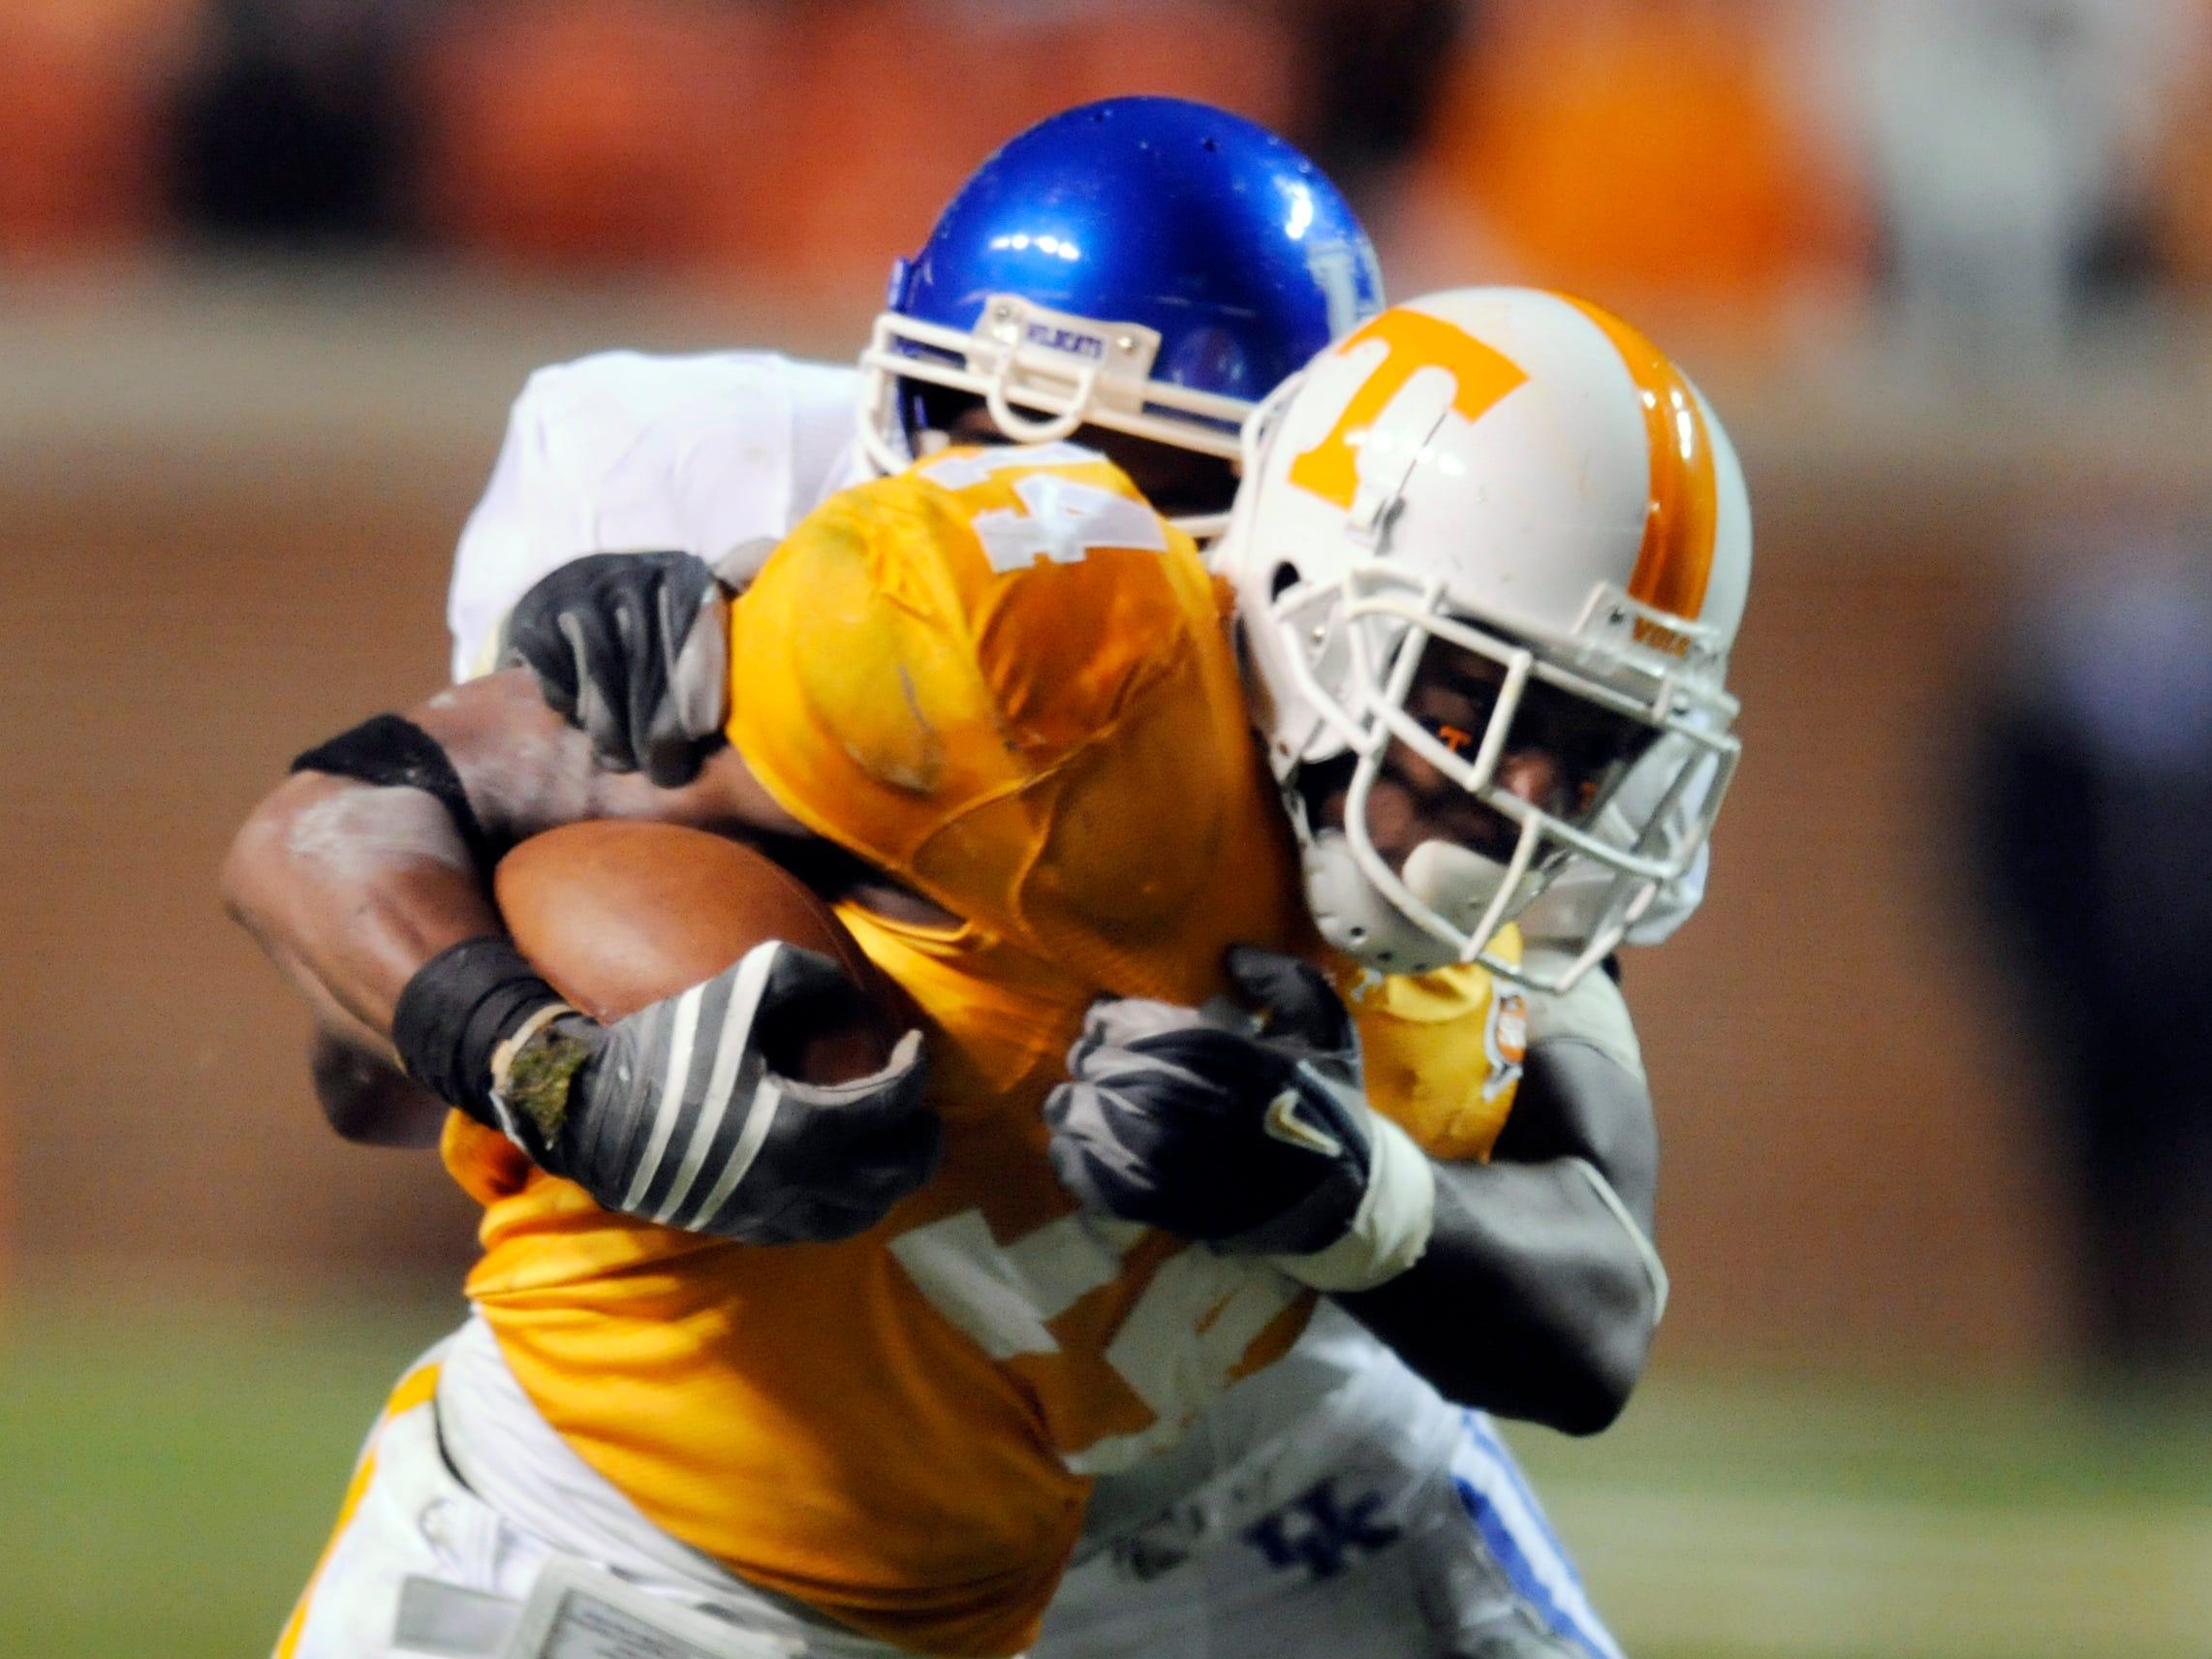 Tennessee's Eric Berry (14) slips away from a Kentucky defender Saturday night in Neyland Stadium.